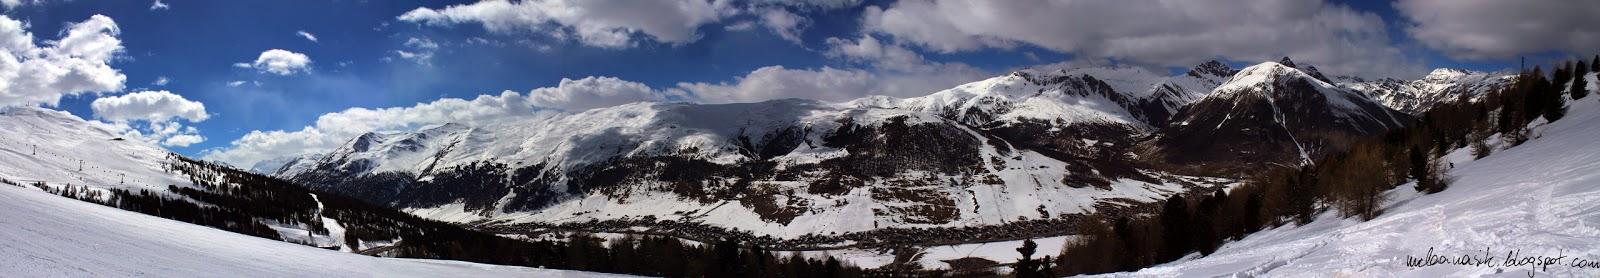 mcbanasik, maciej, banasik, livigno, alpy, alpes, panorama